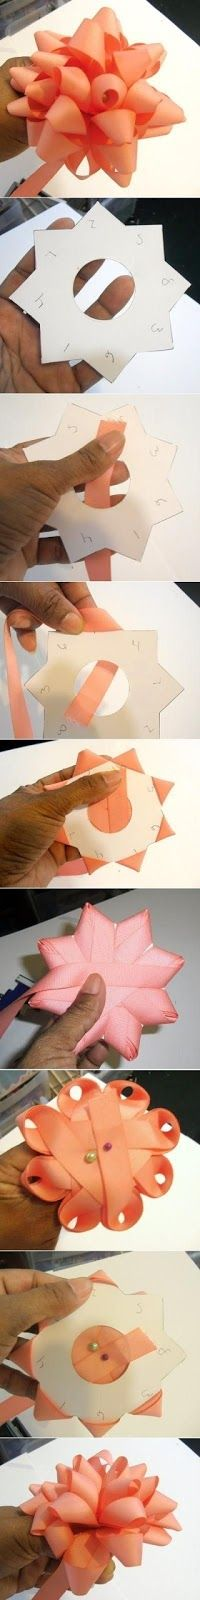 DIY Ribbon Bow | Photo Place